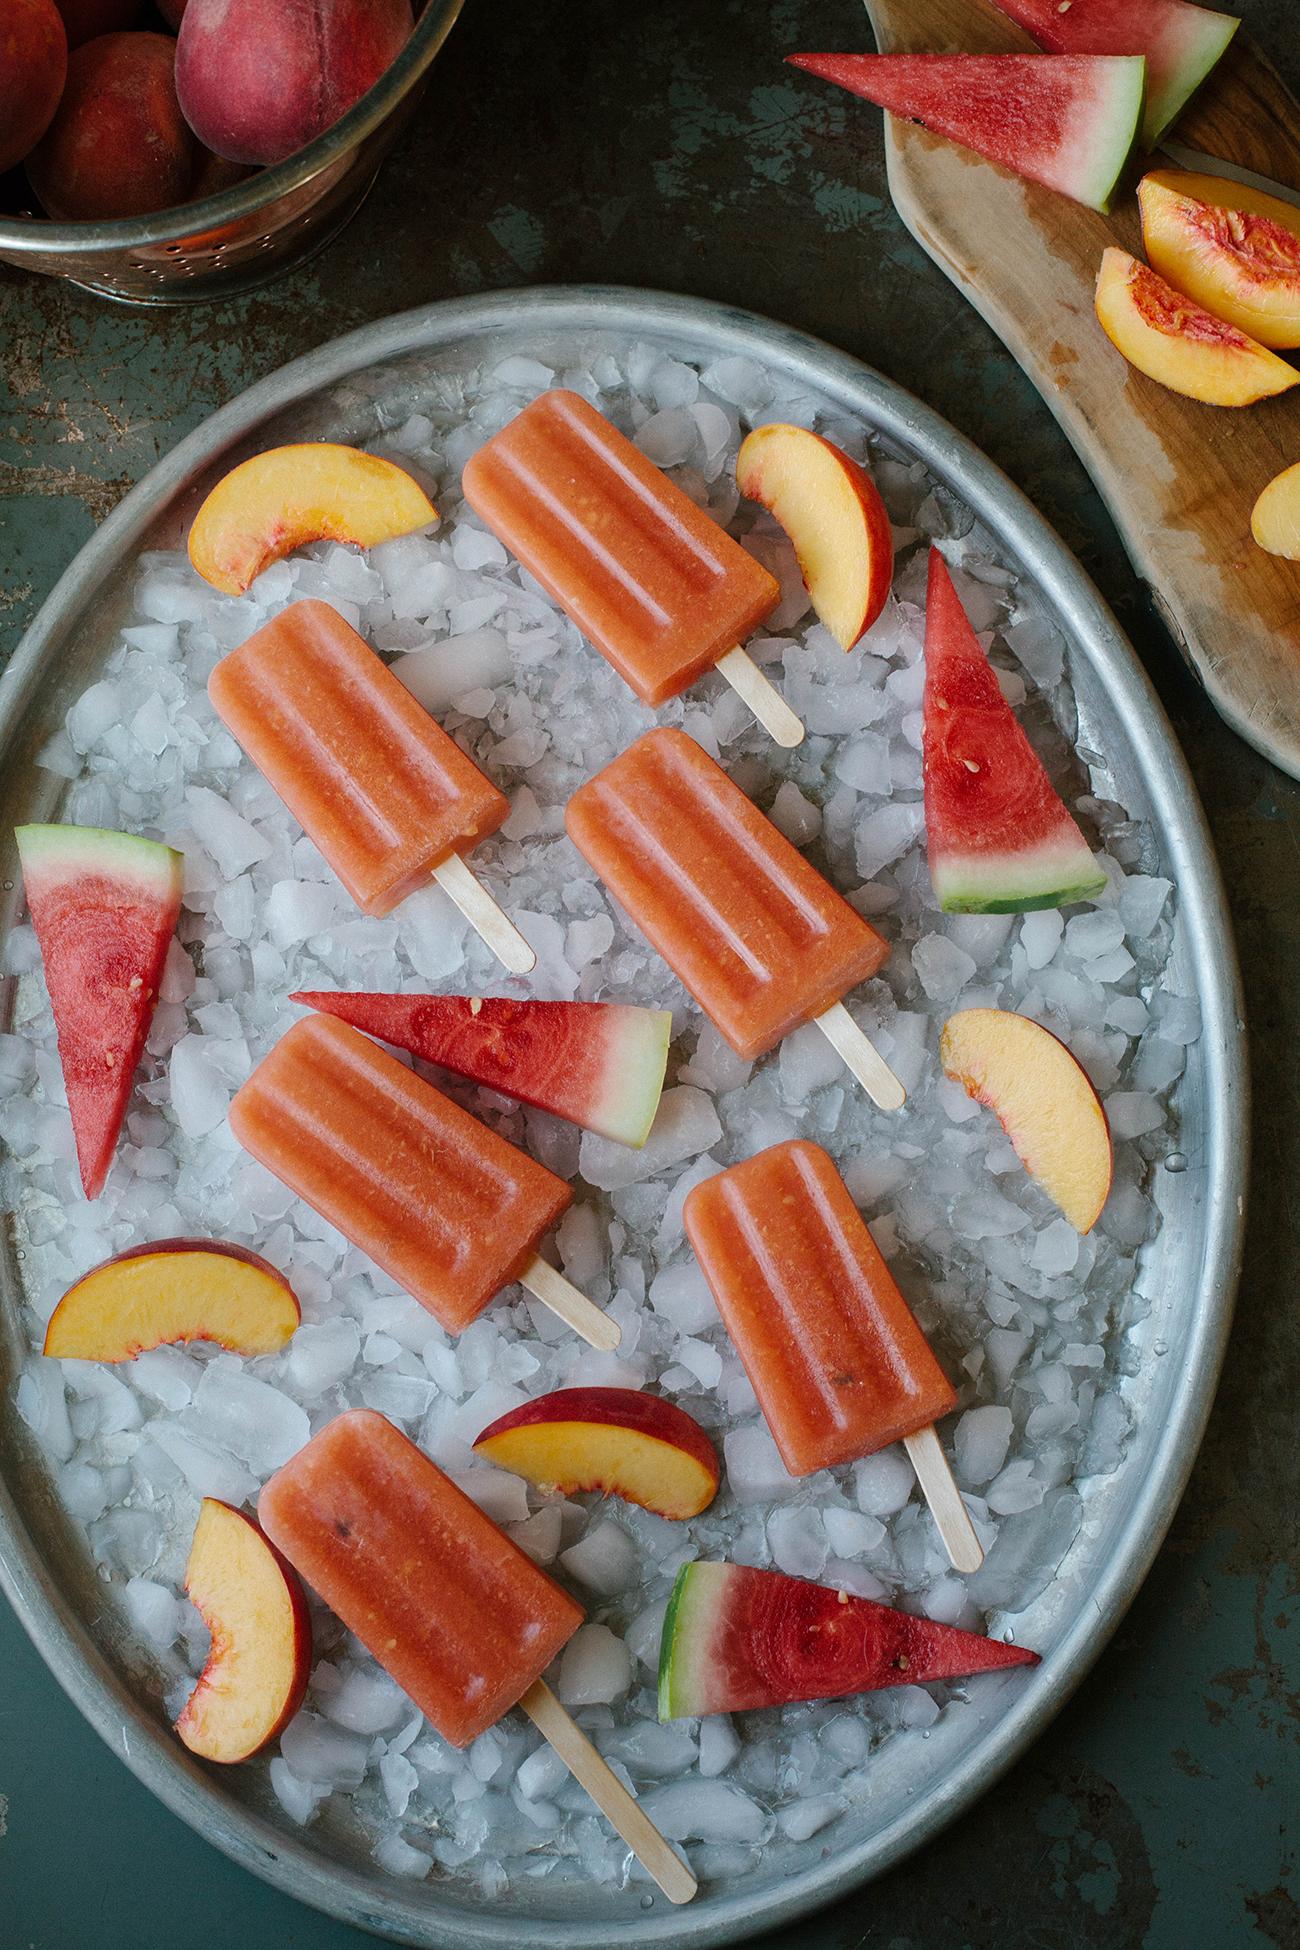 Watermelon Peach Popsicle -